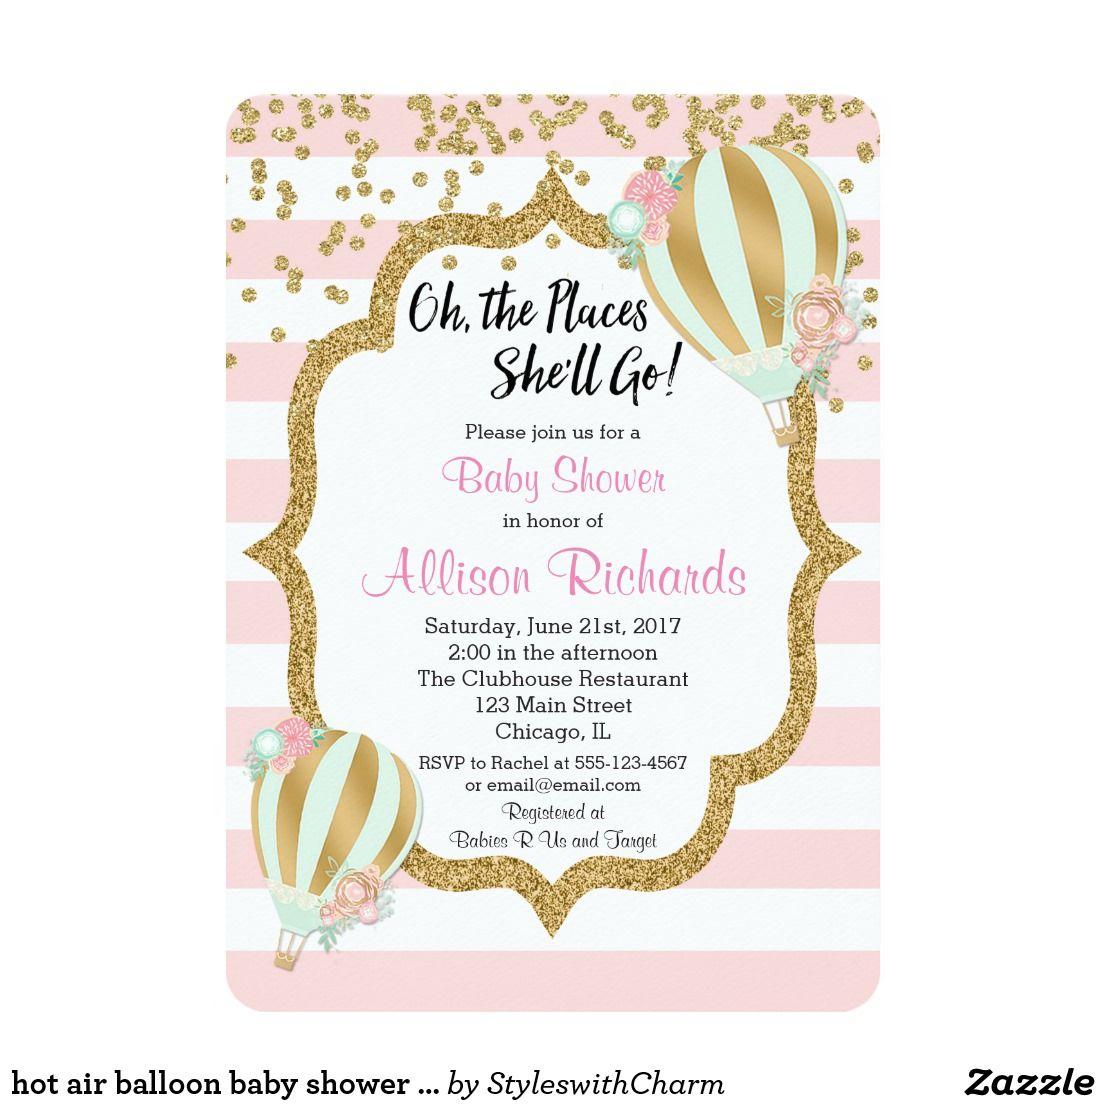 Hot air balloon baby shower invitation pink gold | Pinterest ...